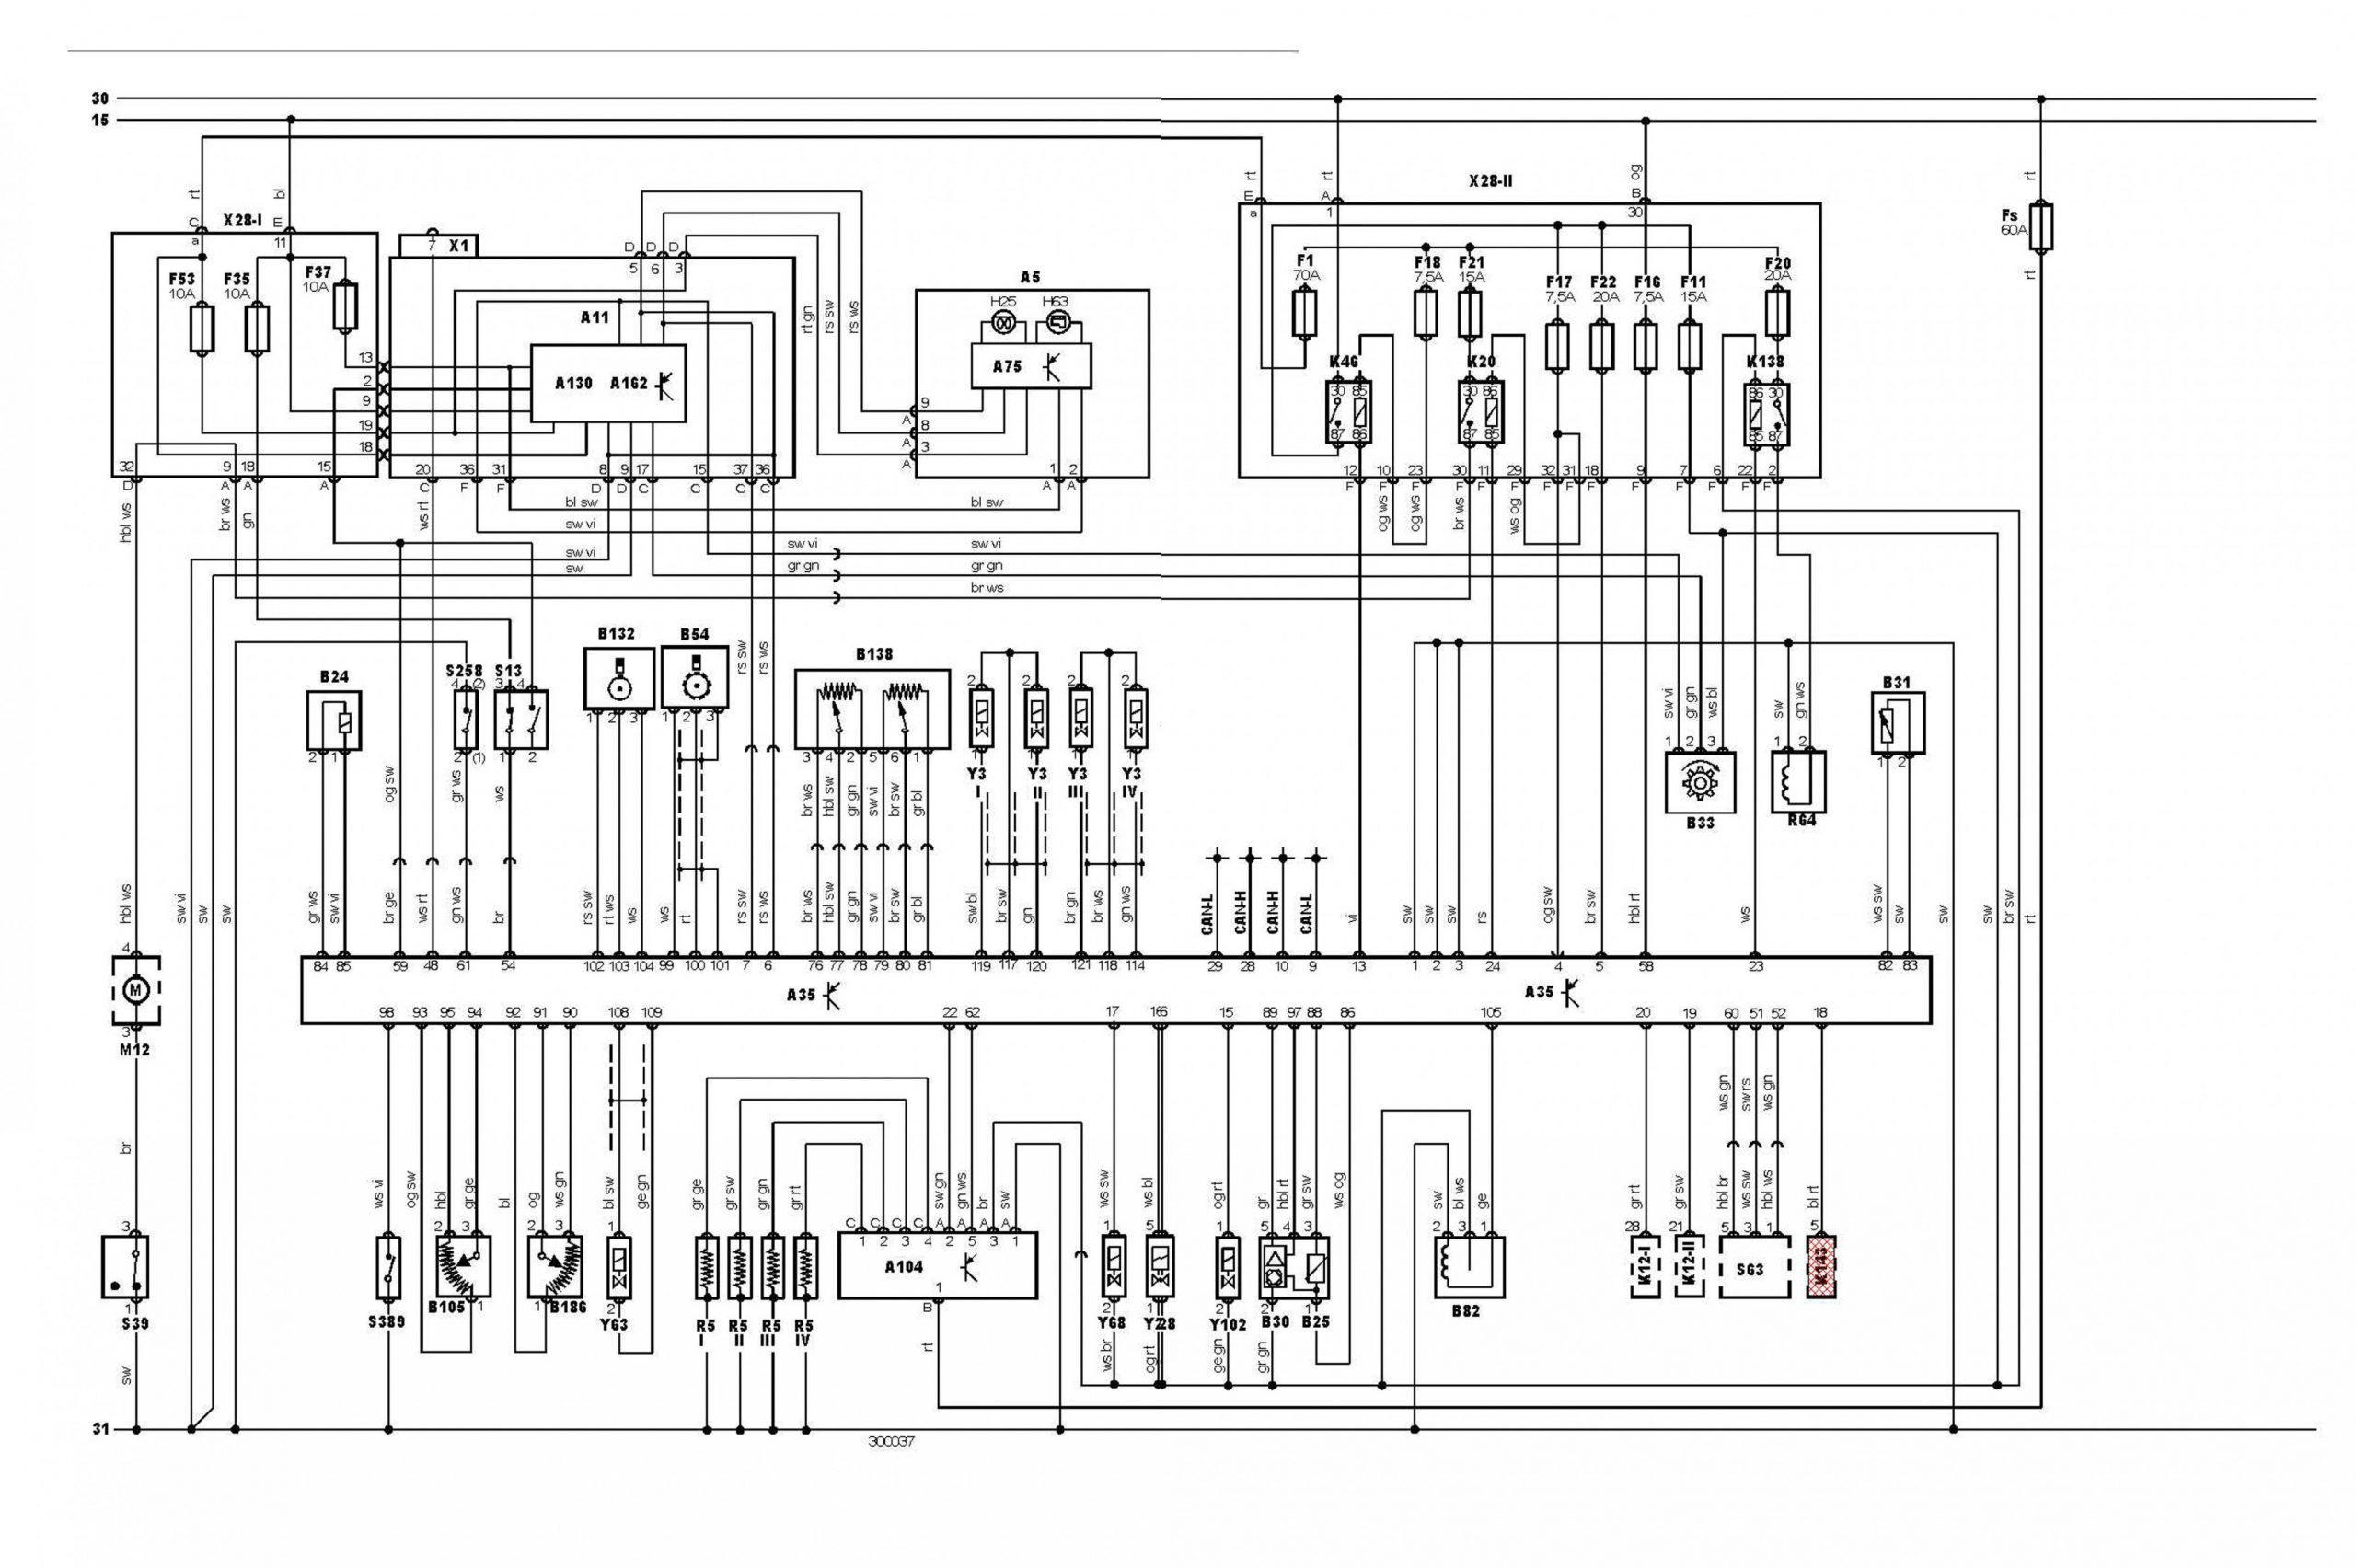 Wiring Jeep Tj Engine Wiring Diagram Hd Quality 3dprintdiagram Bruxelles Enscene Be